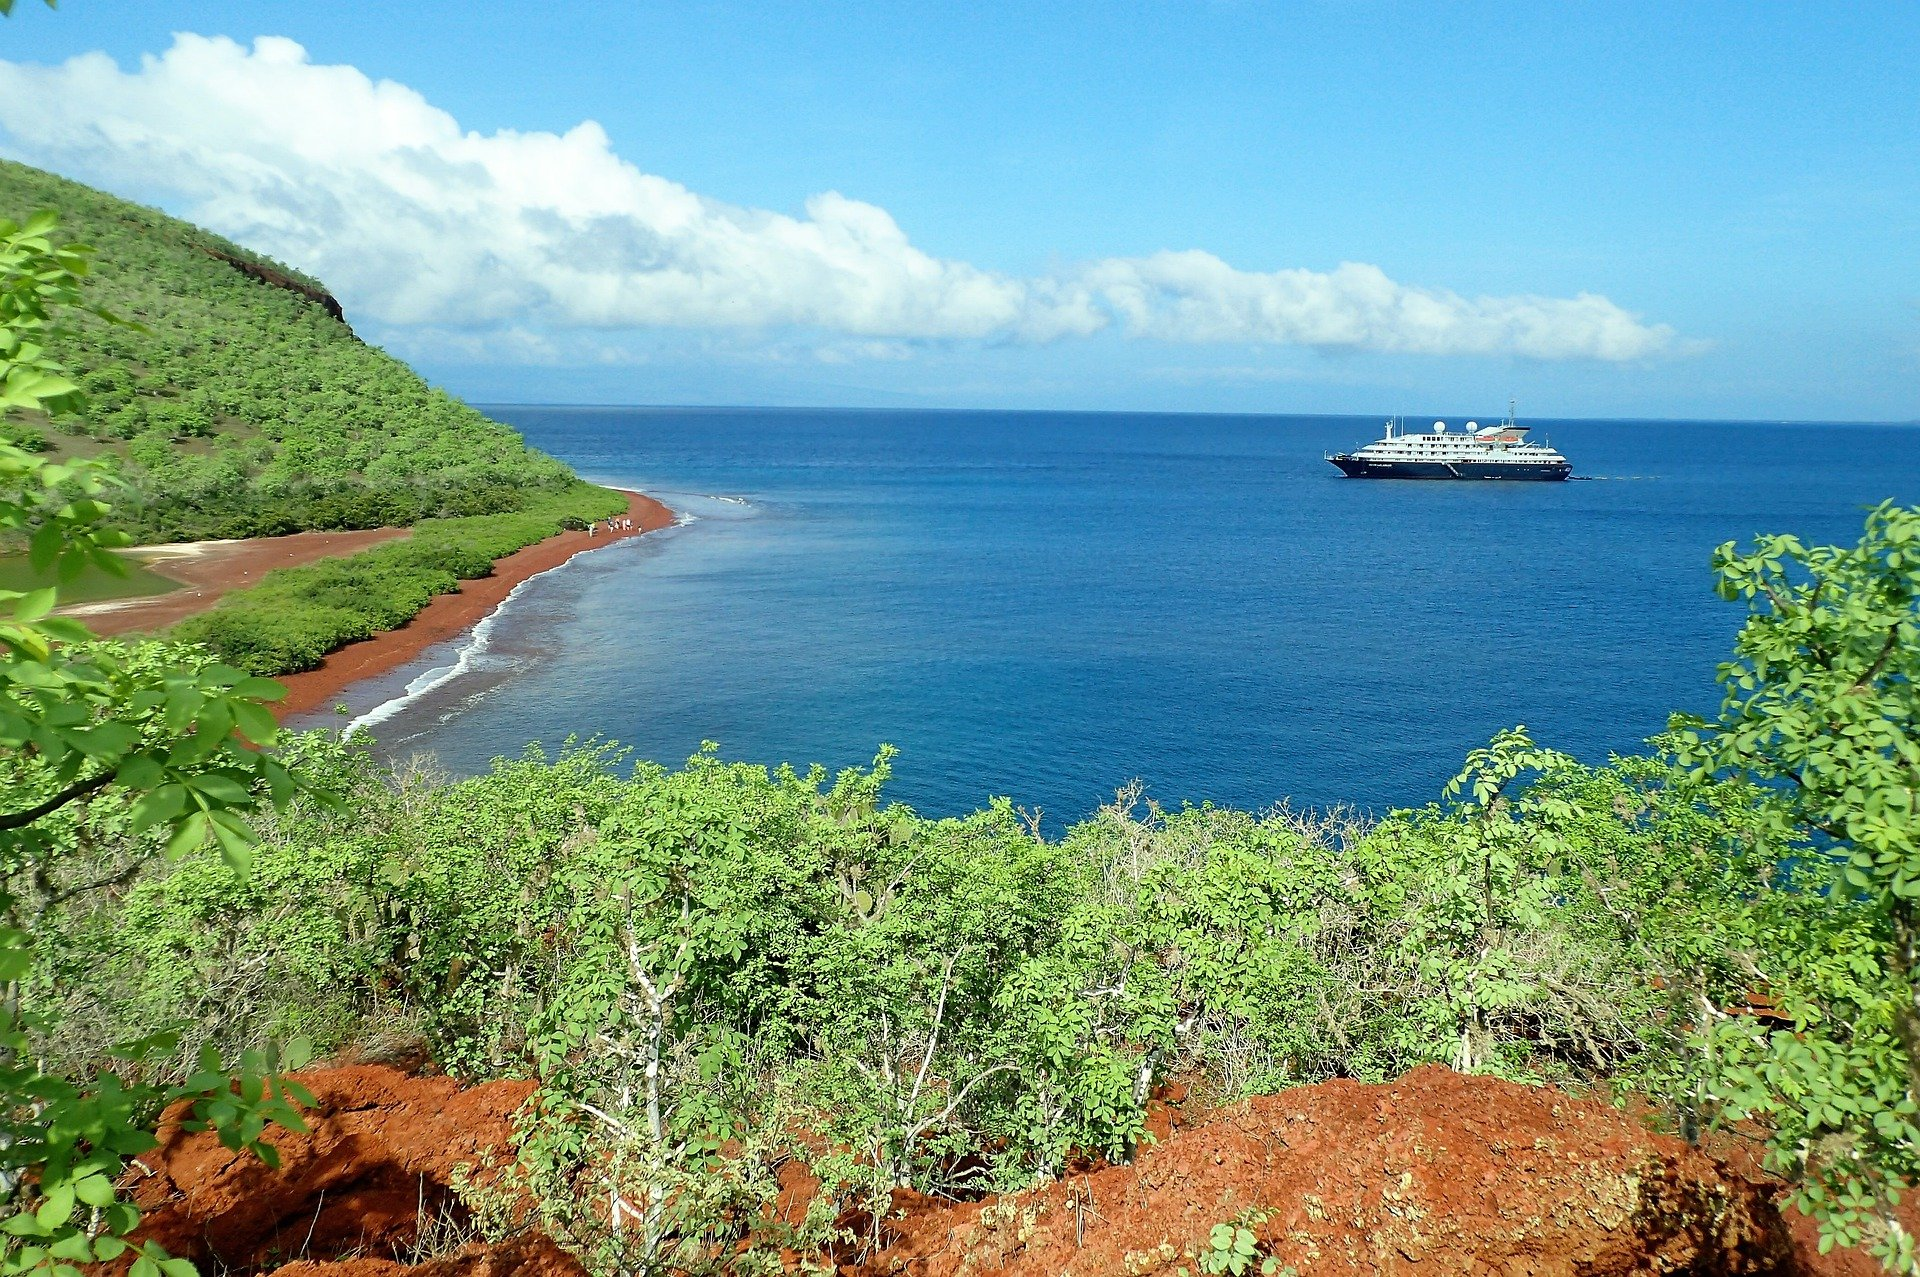 Galapagos with Cruise Ship